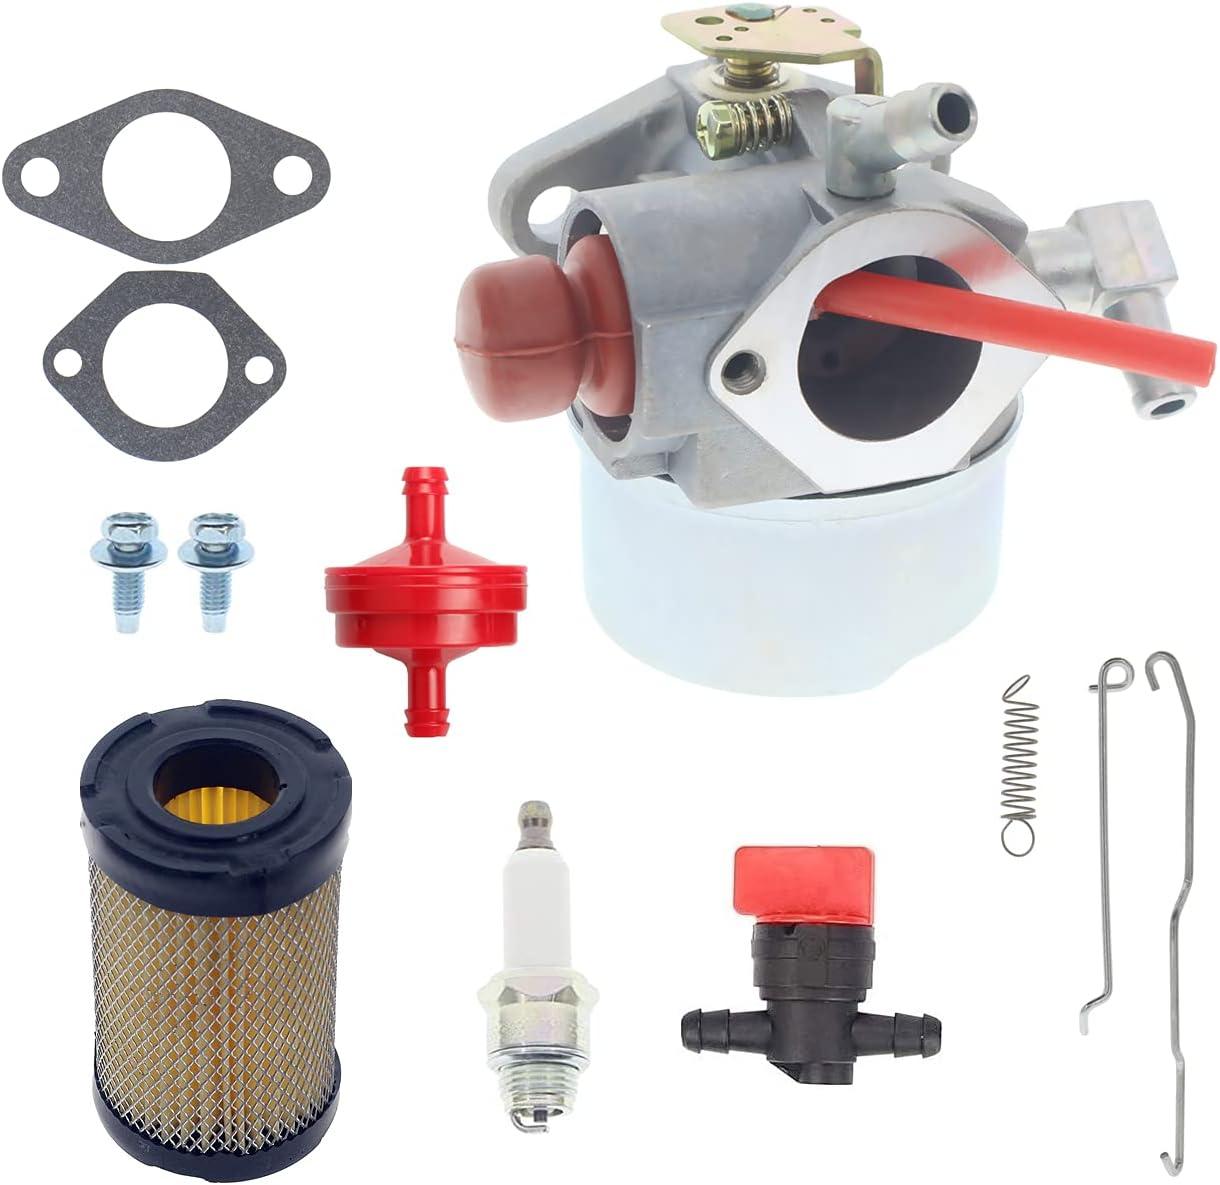 Cnfaner 640339 Carburetor + 35066 Air Tampa Mall Sale Tecumseh Filter for LEV90